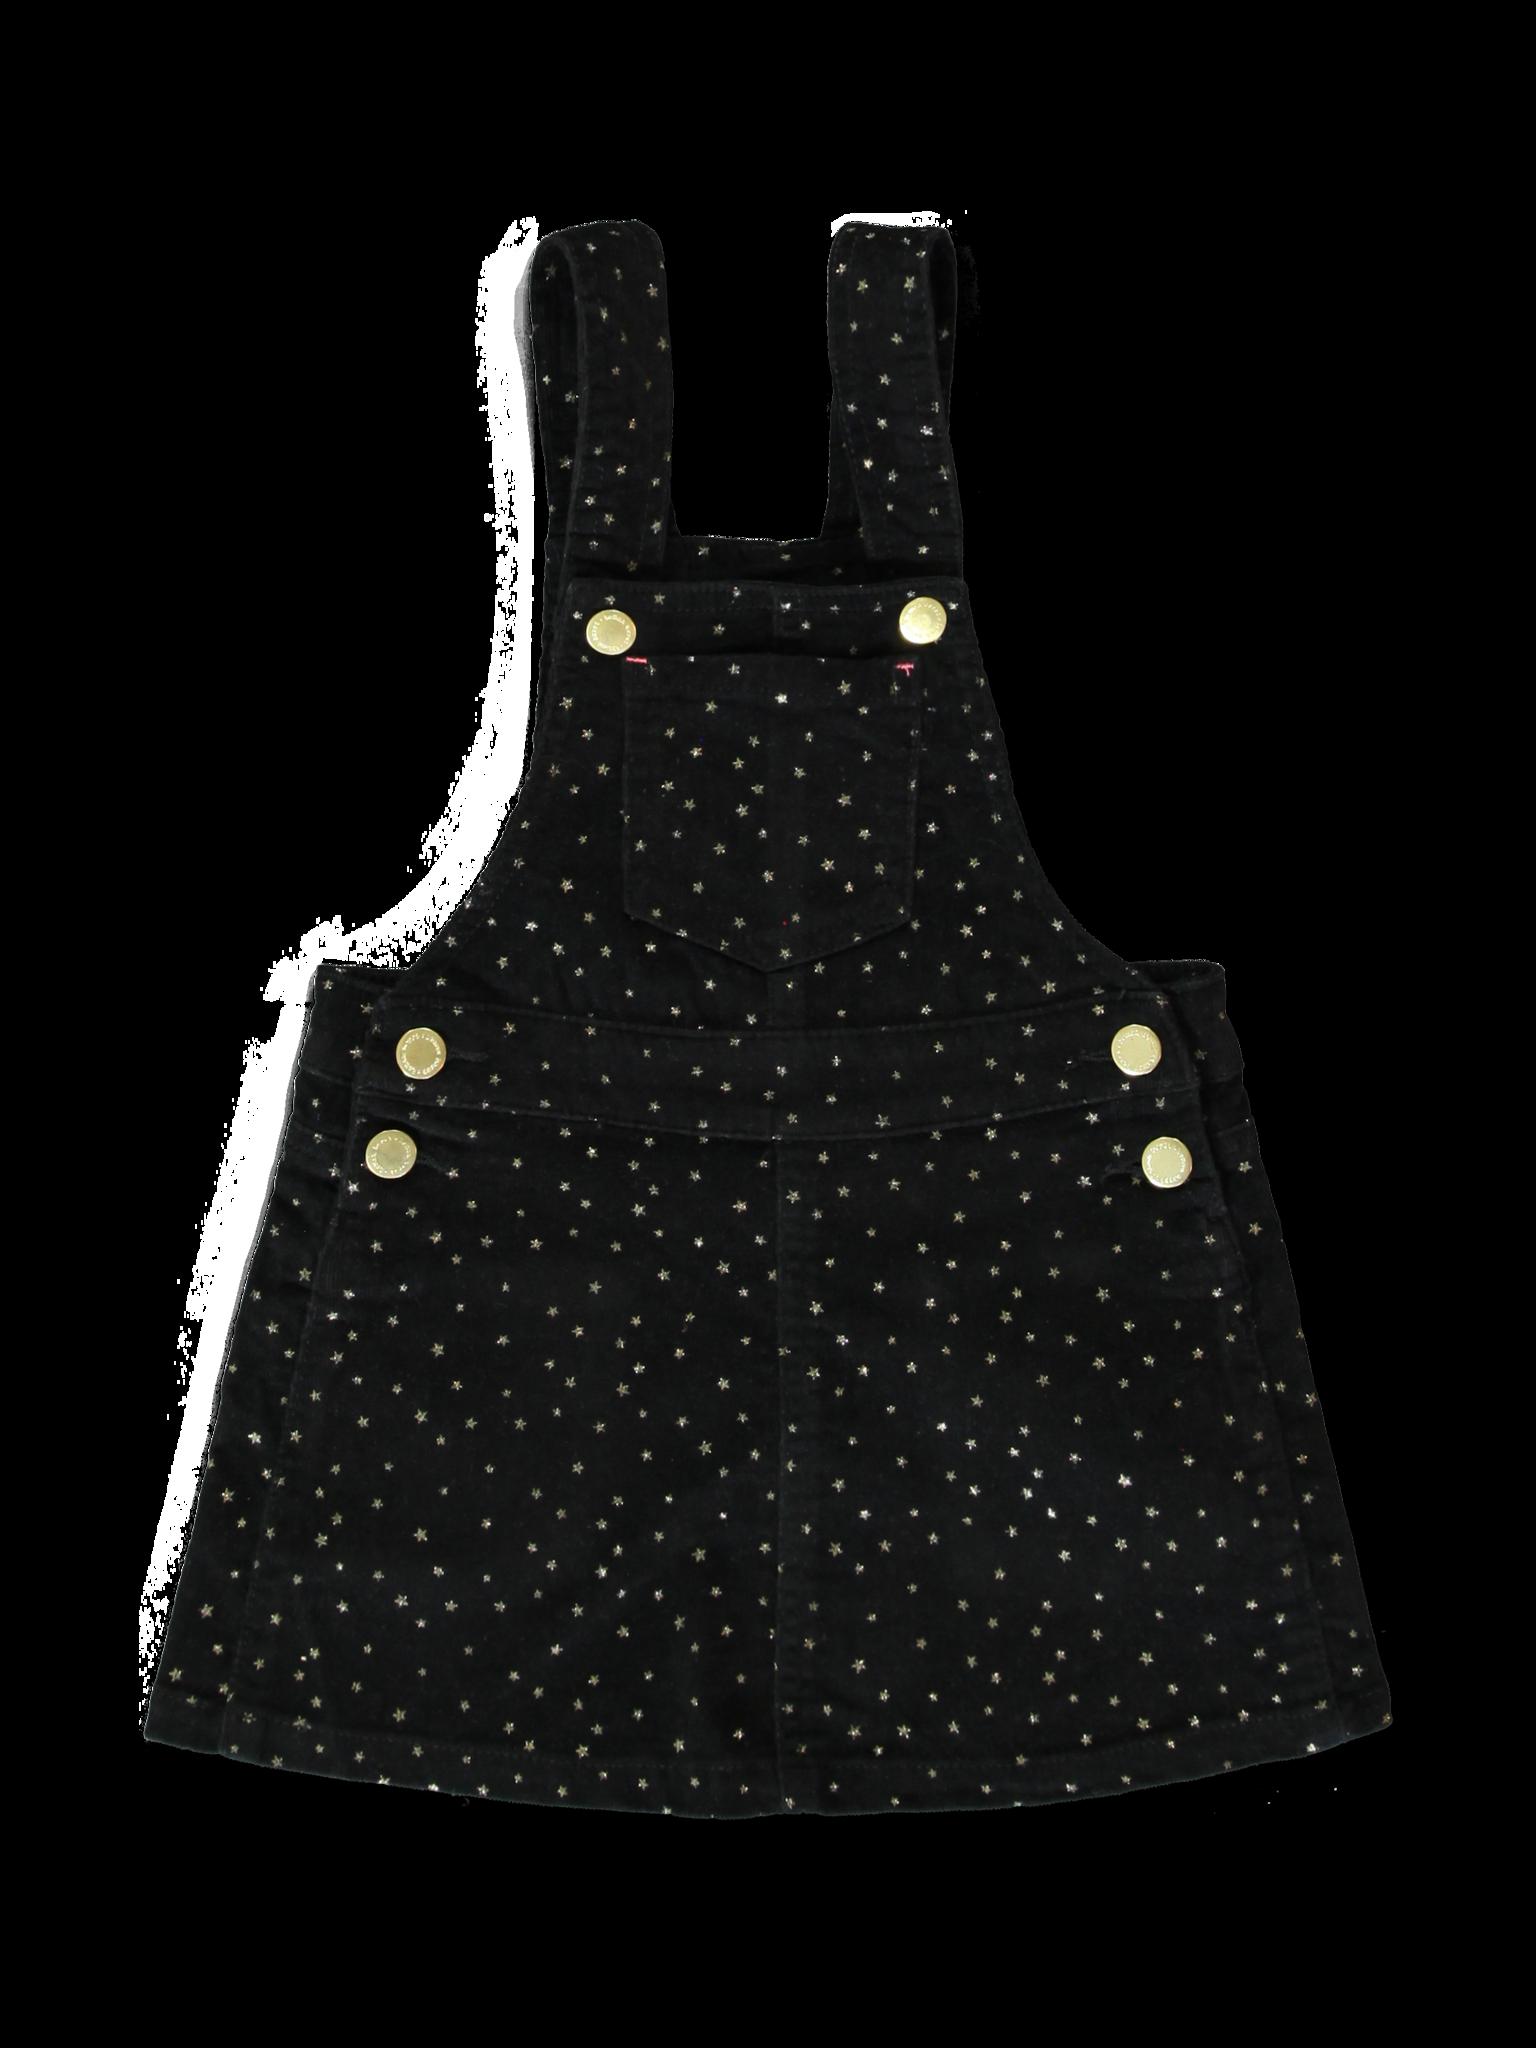 Lemon Beret | Winter 2019 Small Girls | Dress | 10 pcs/box